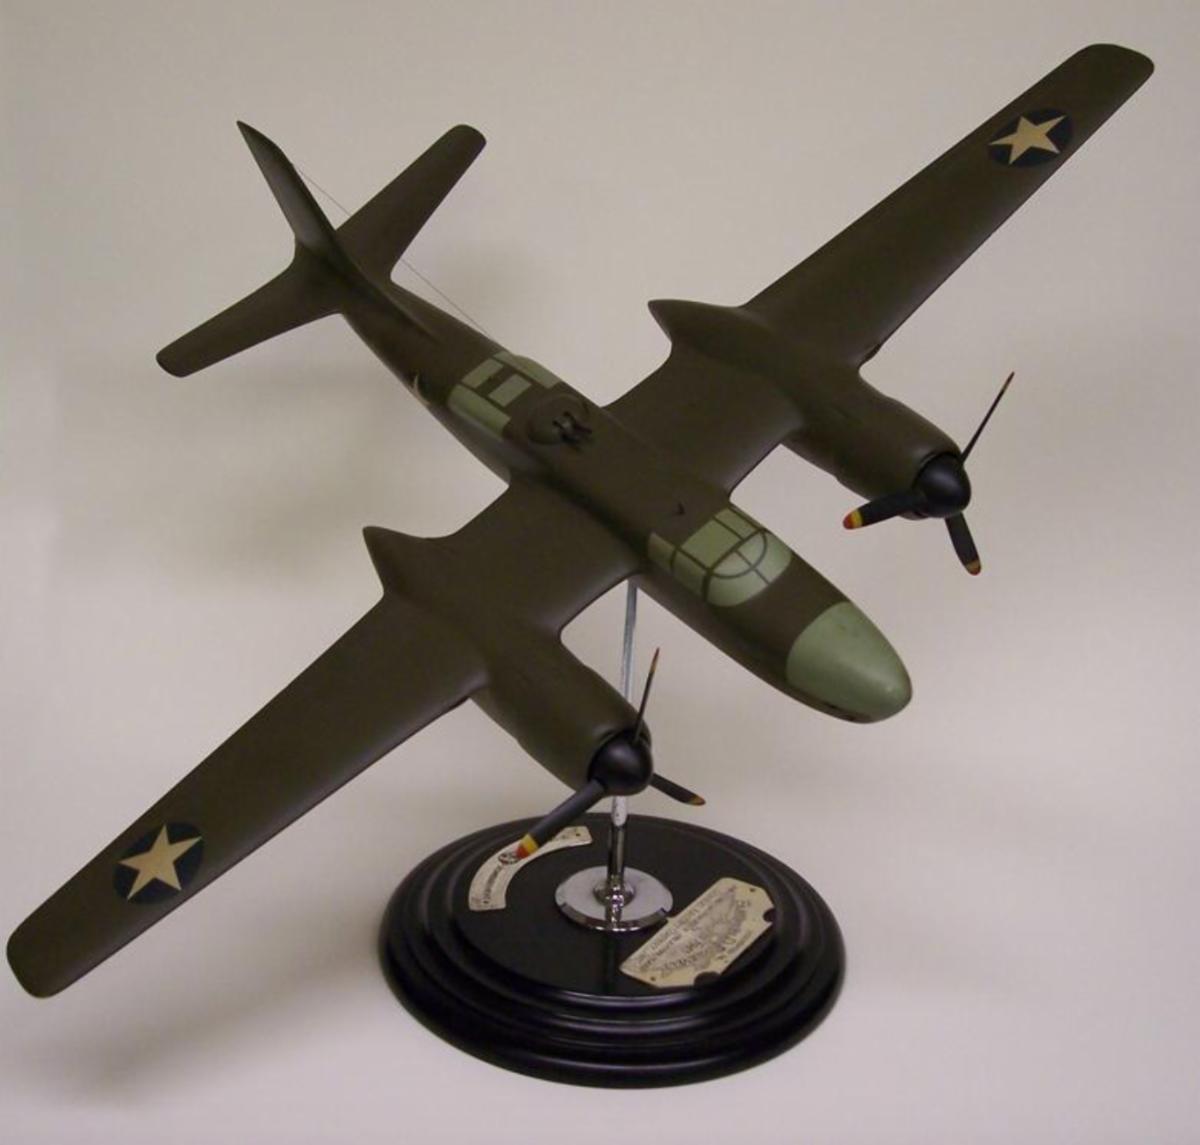 Model of the Douglas A-26 Bomber